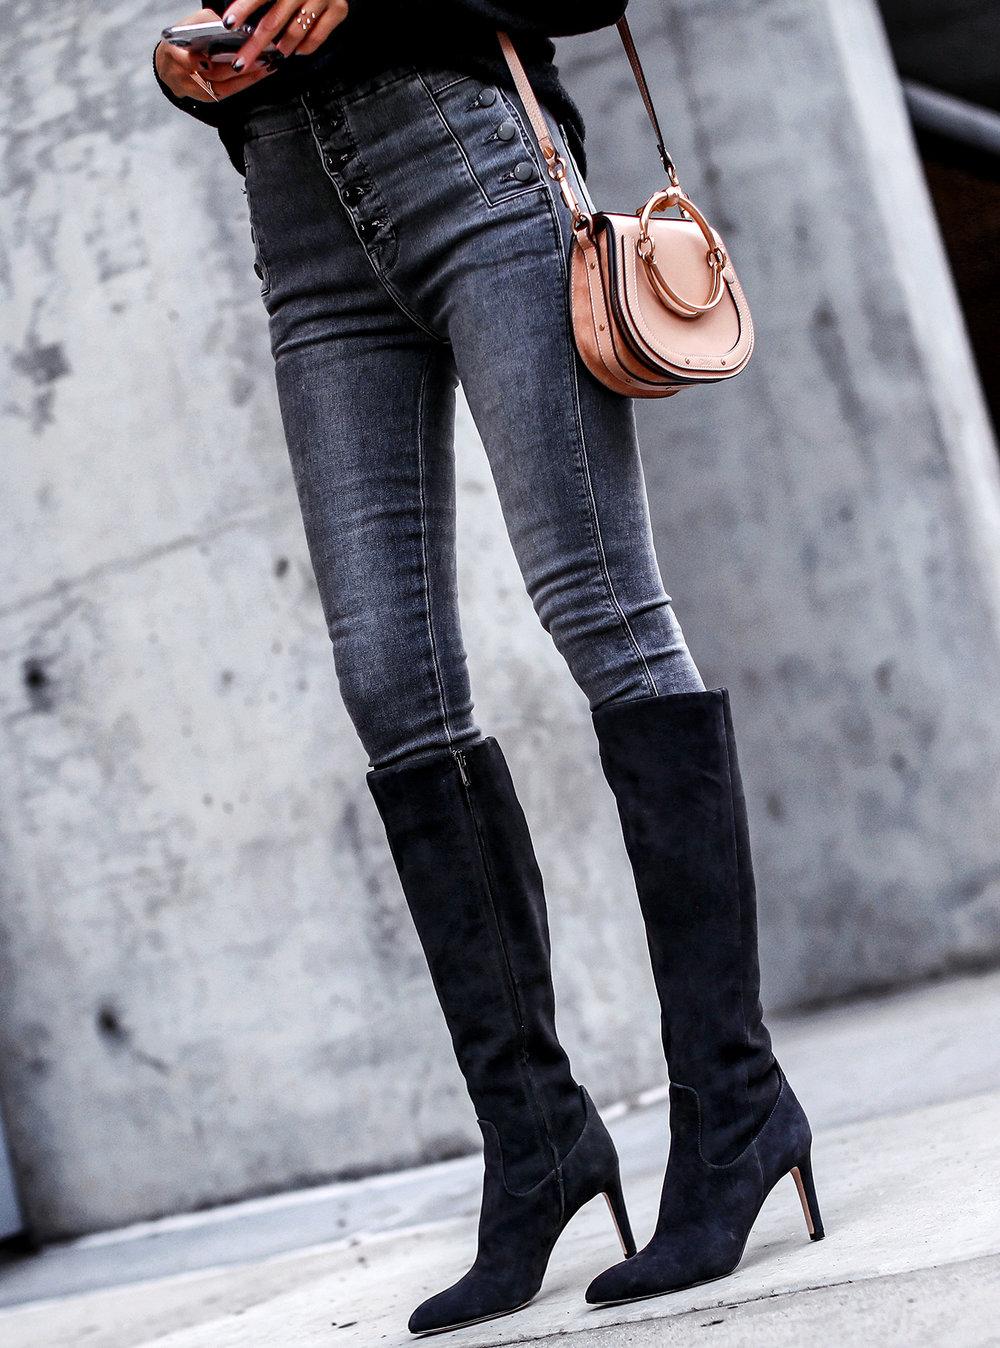 JBrand Jeans Joei Sweater Spring Fashion Sam Edelman Boots Chloe Nile Bag.jpg